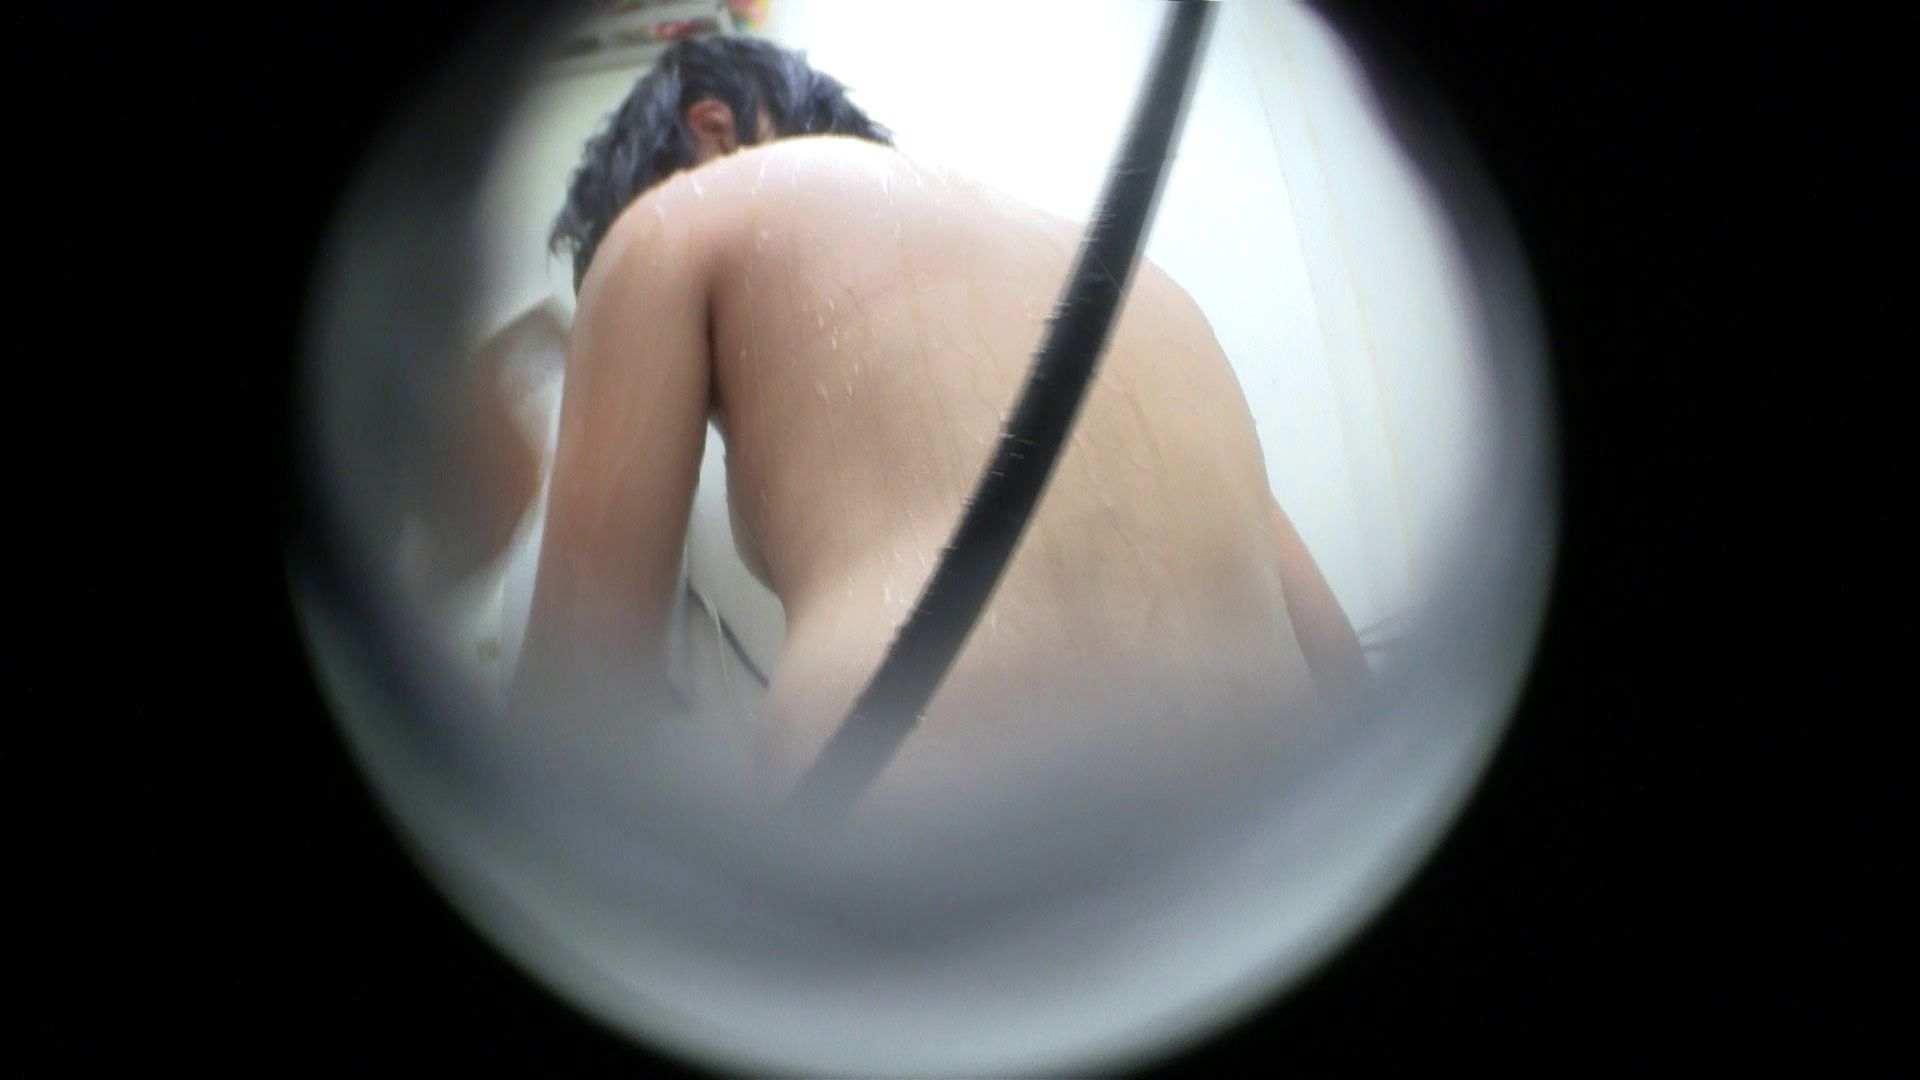 NO.43 乳首の先がチラ 背中でイメージして下さい シャワー | シャワー室  83枚 50